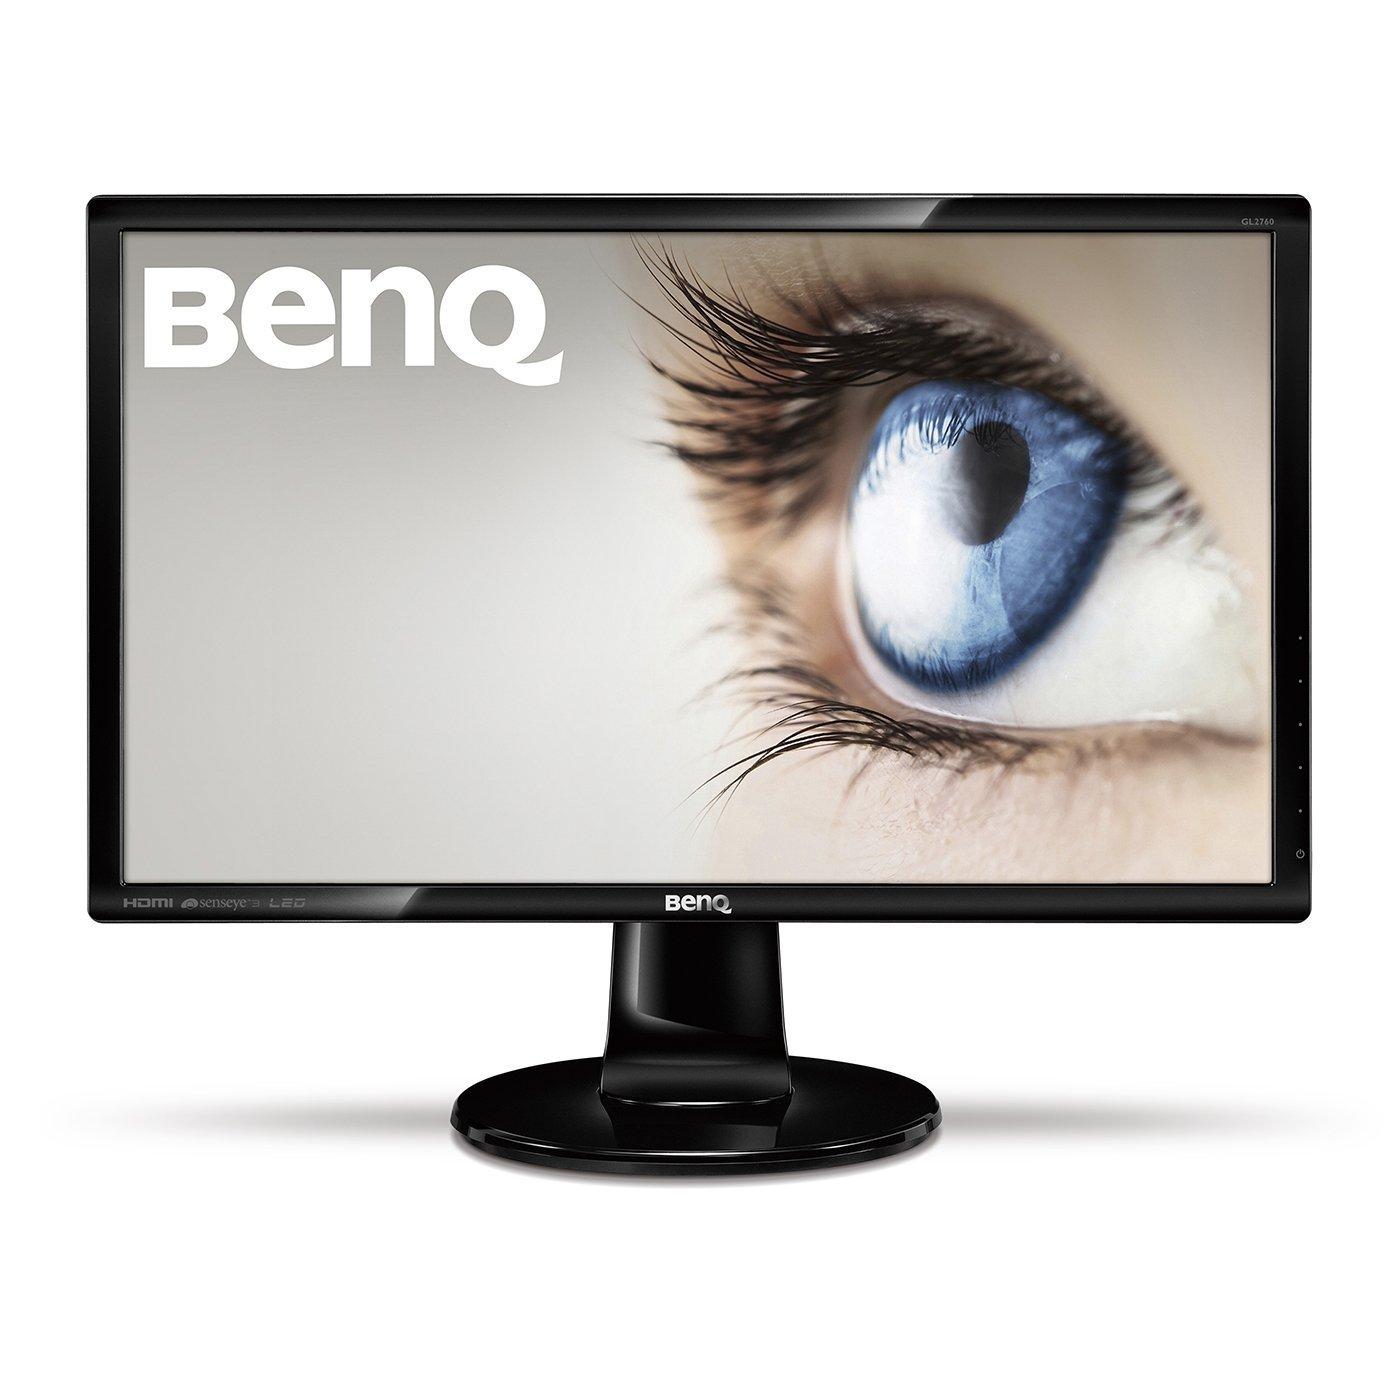 BenQ GL2460HM 24 Inch Full HD 1920x1080 2ms LED Monitor HDMI DVI